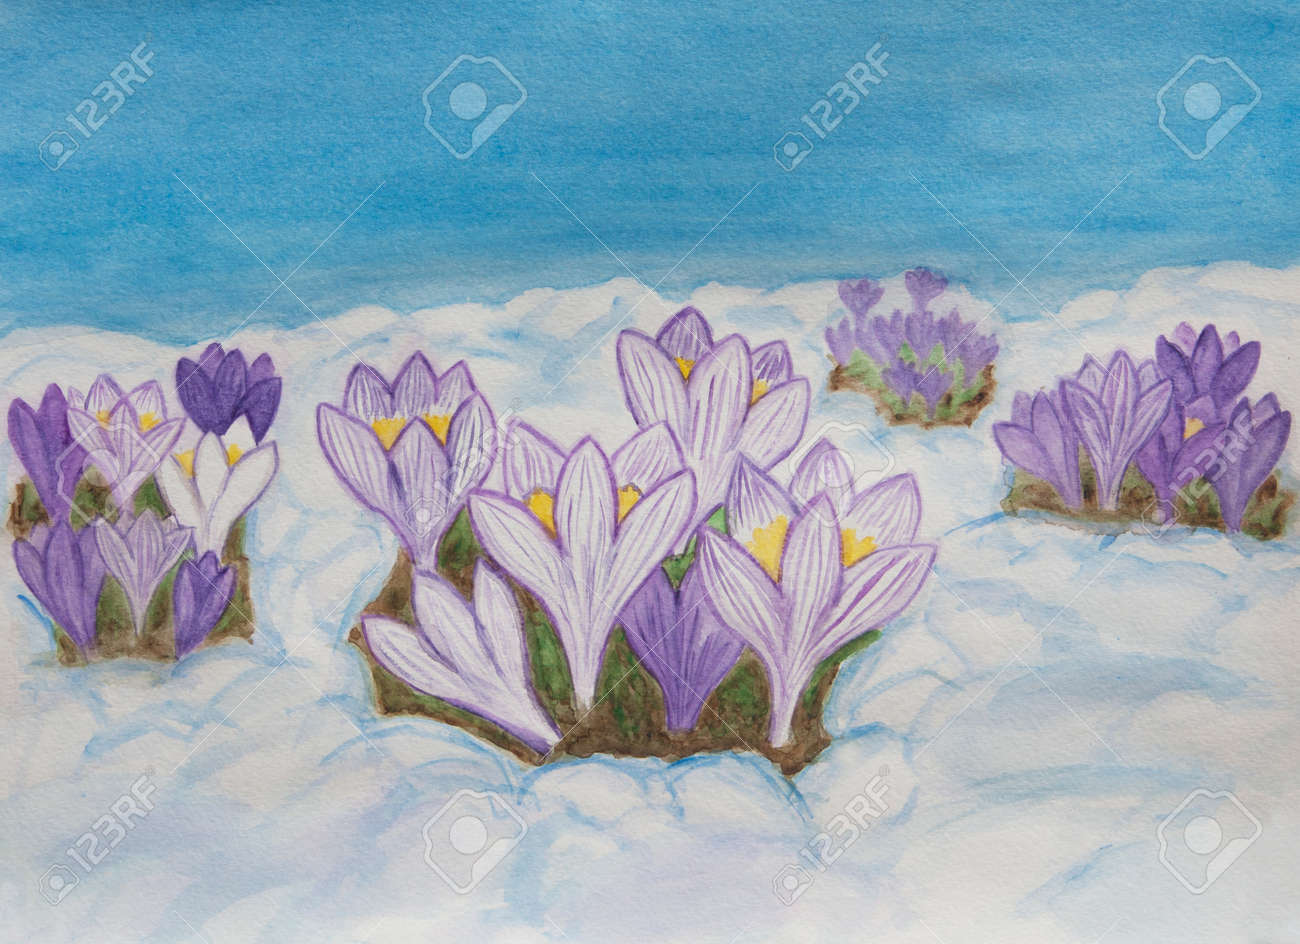 Crocuses first spring flowers in snow illustration painting stock crocuses first spring flowers in snow illustration painting watercolor horizontal stock illustration mightylinksfo